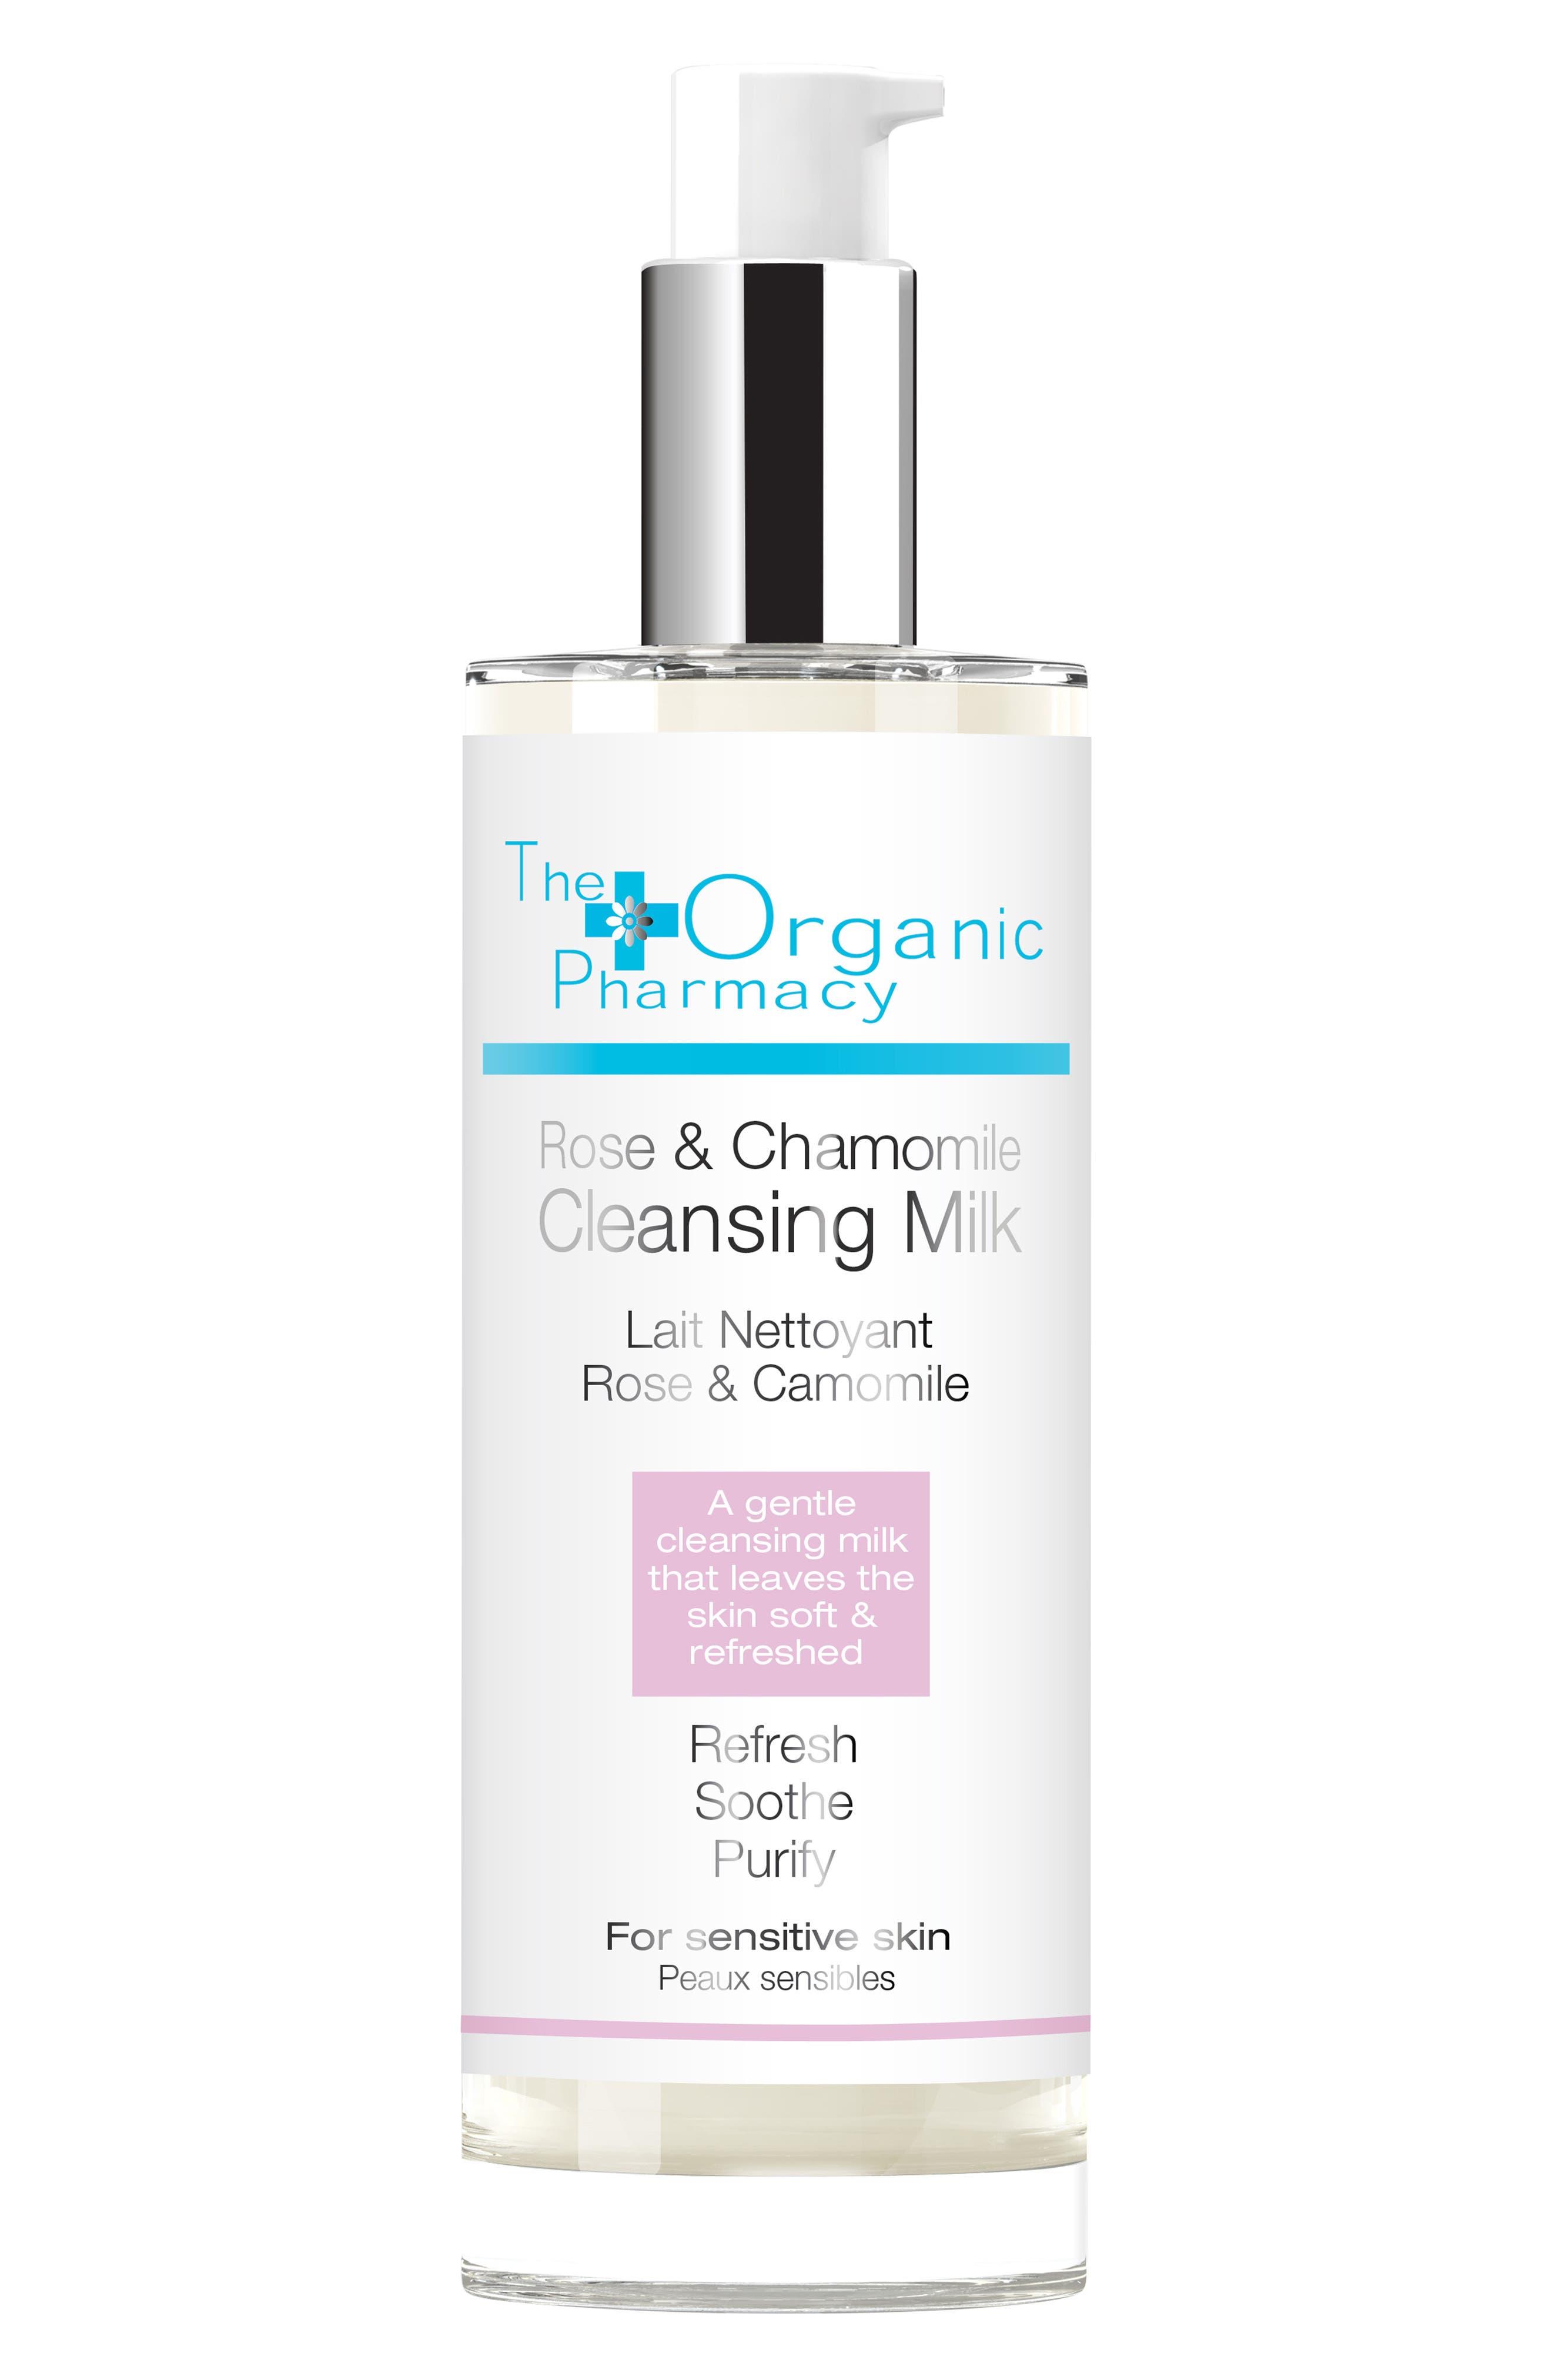 THE ORGANIC PHARMACY ROSE & CHAMOMILE CLEANSING MILK